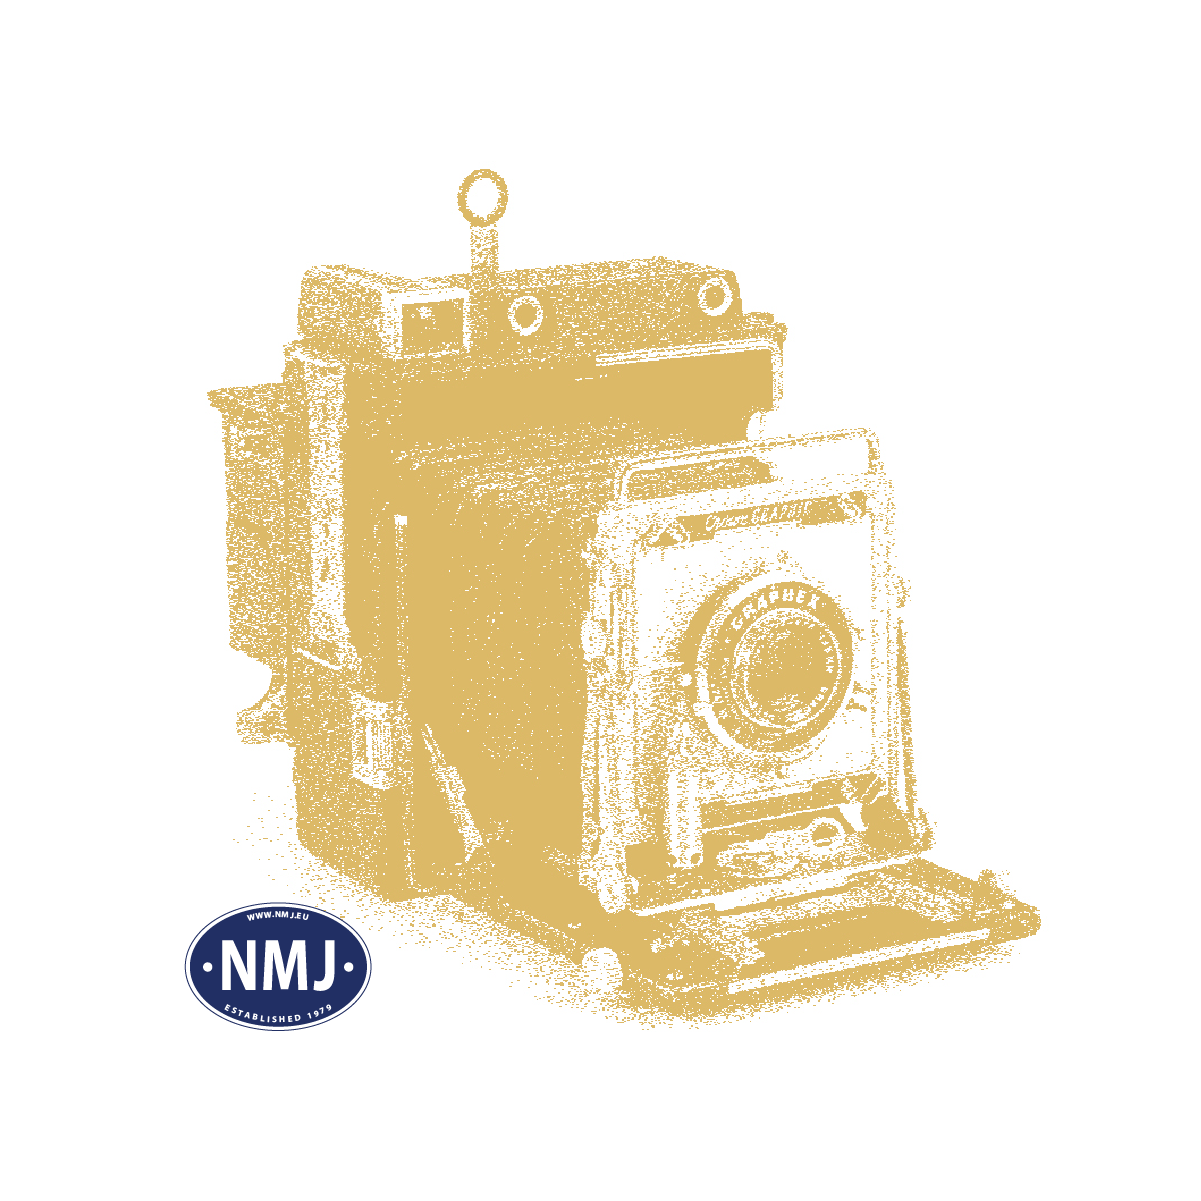 NMJT133.102 - NMJ Topline NSB BF10 21511, Gammeldesign, (rotbraun)